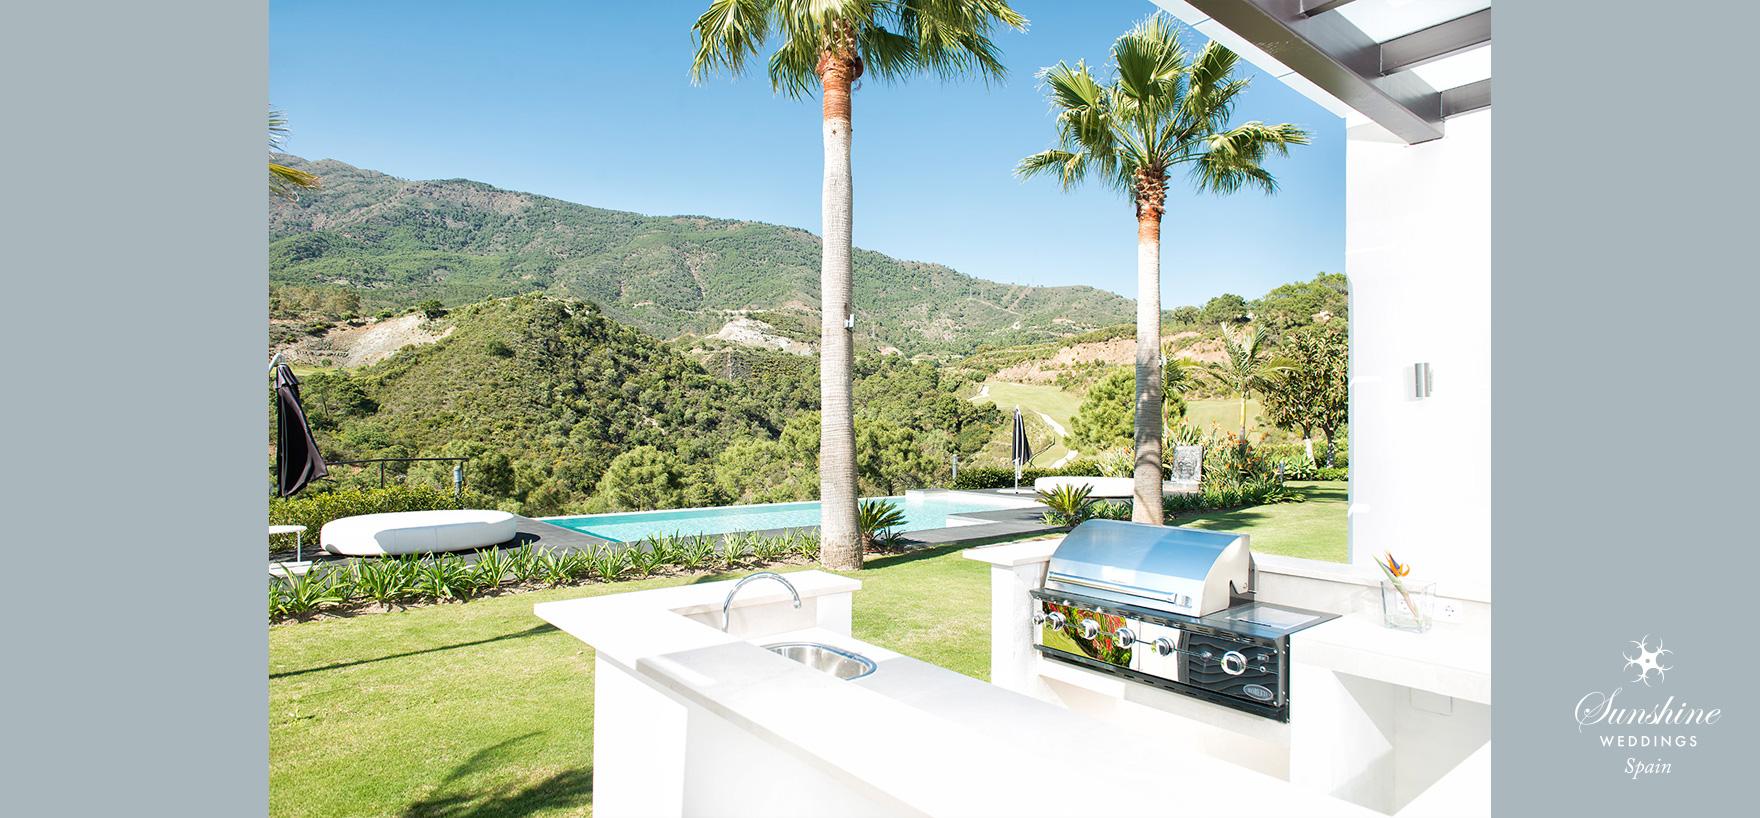 Luxury wedding resort